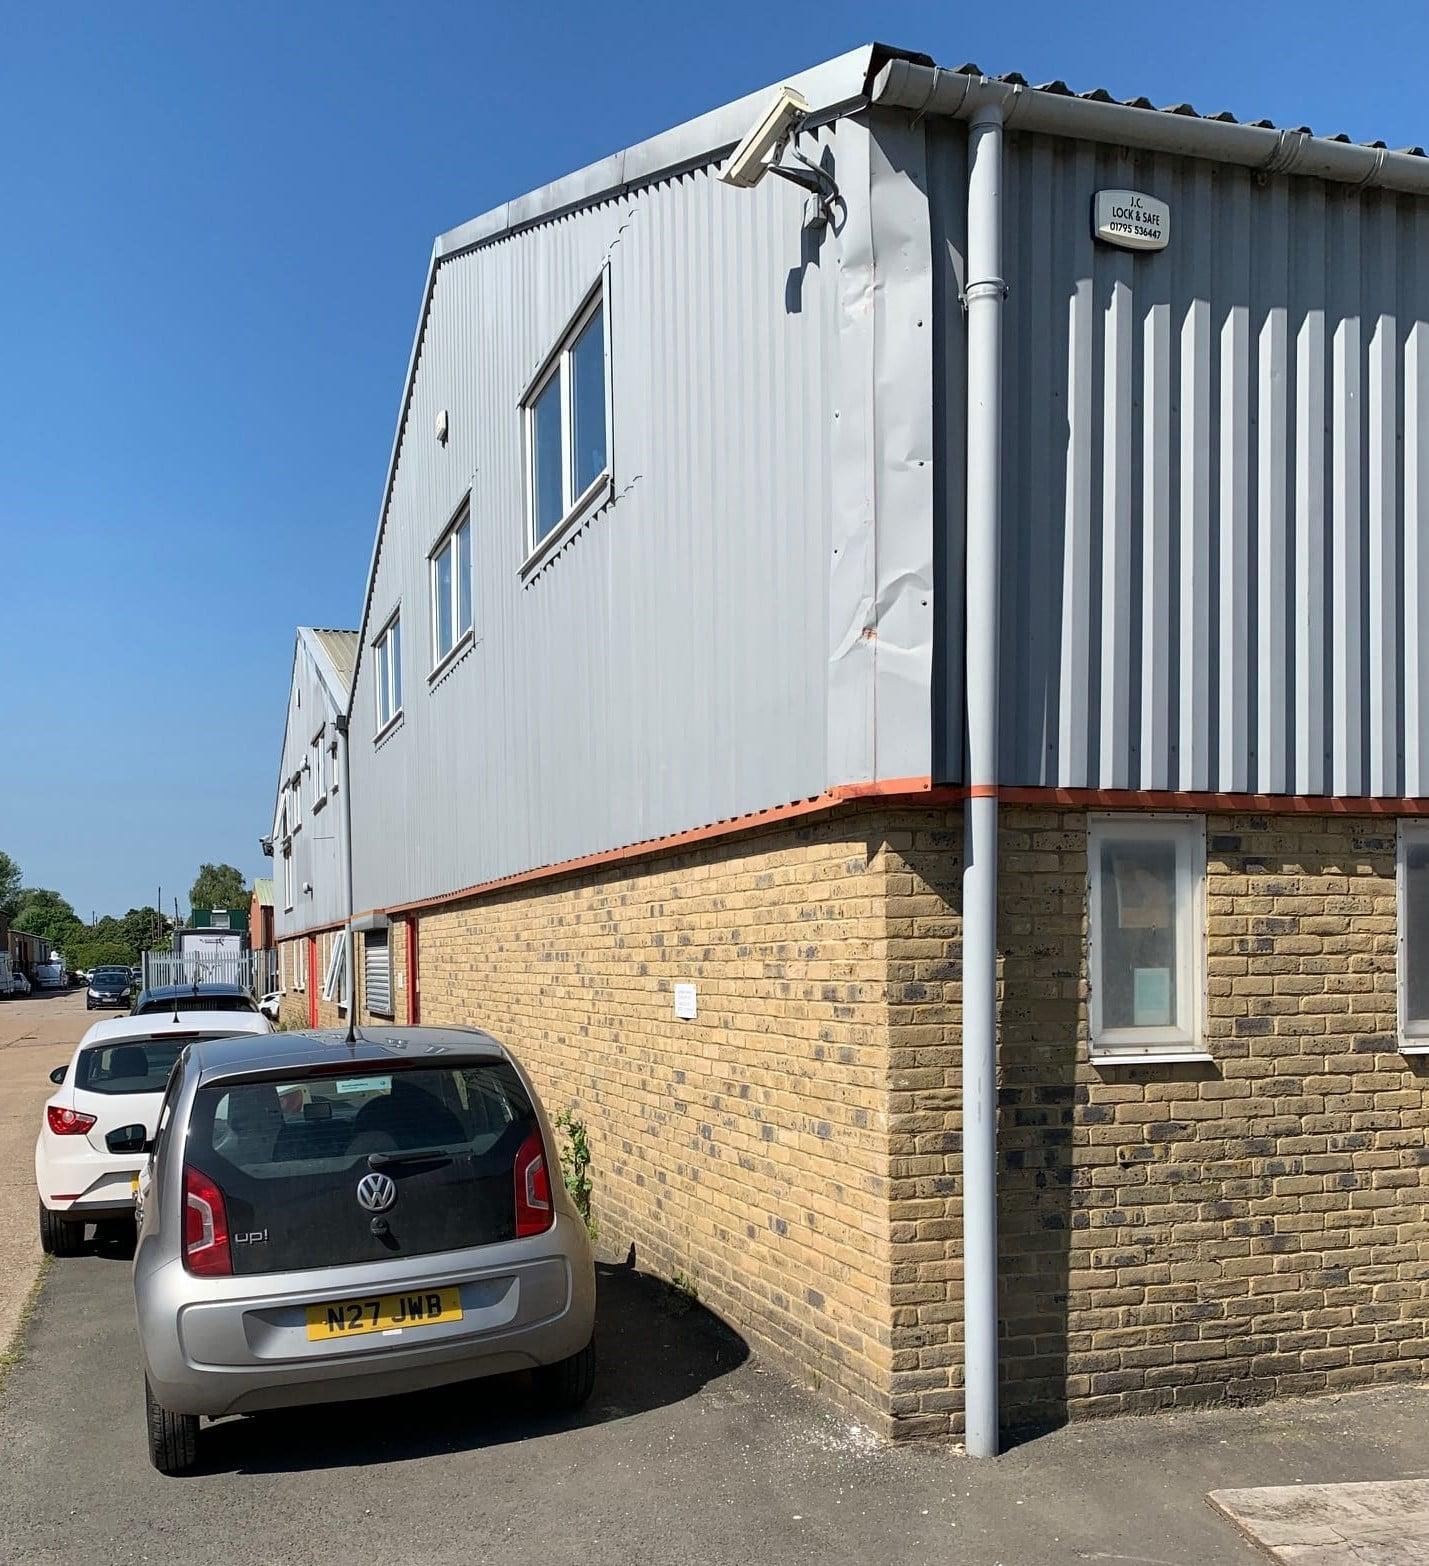 cladding repair damage on an industrial building in Faversham Kent